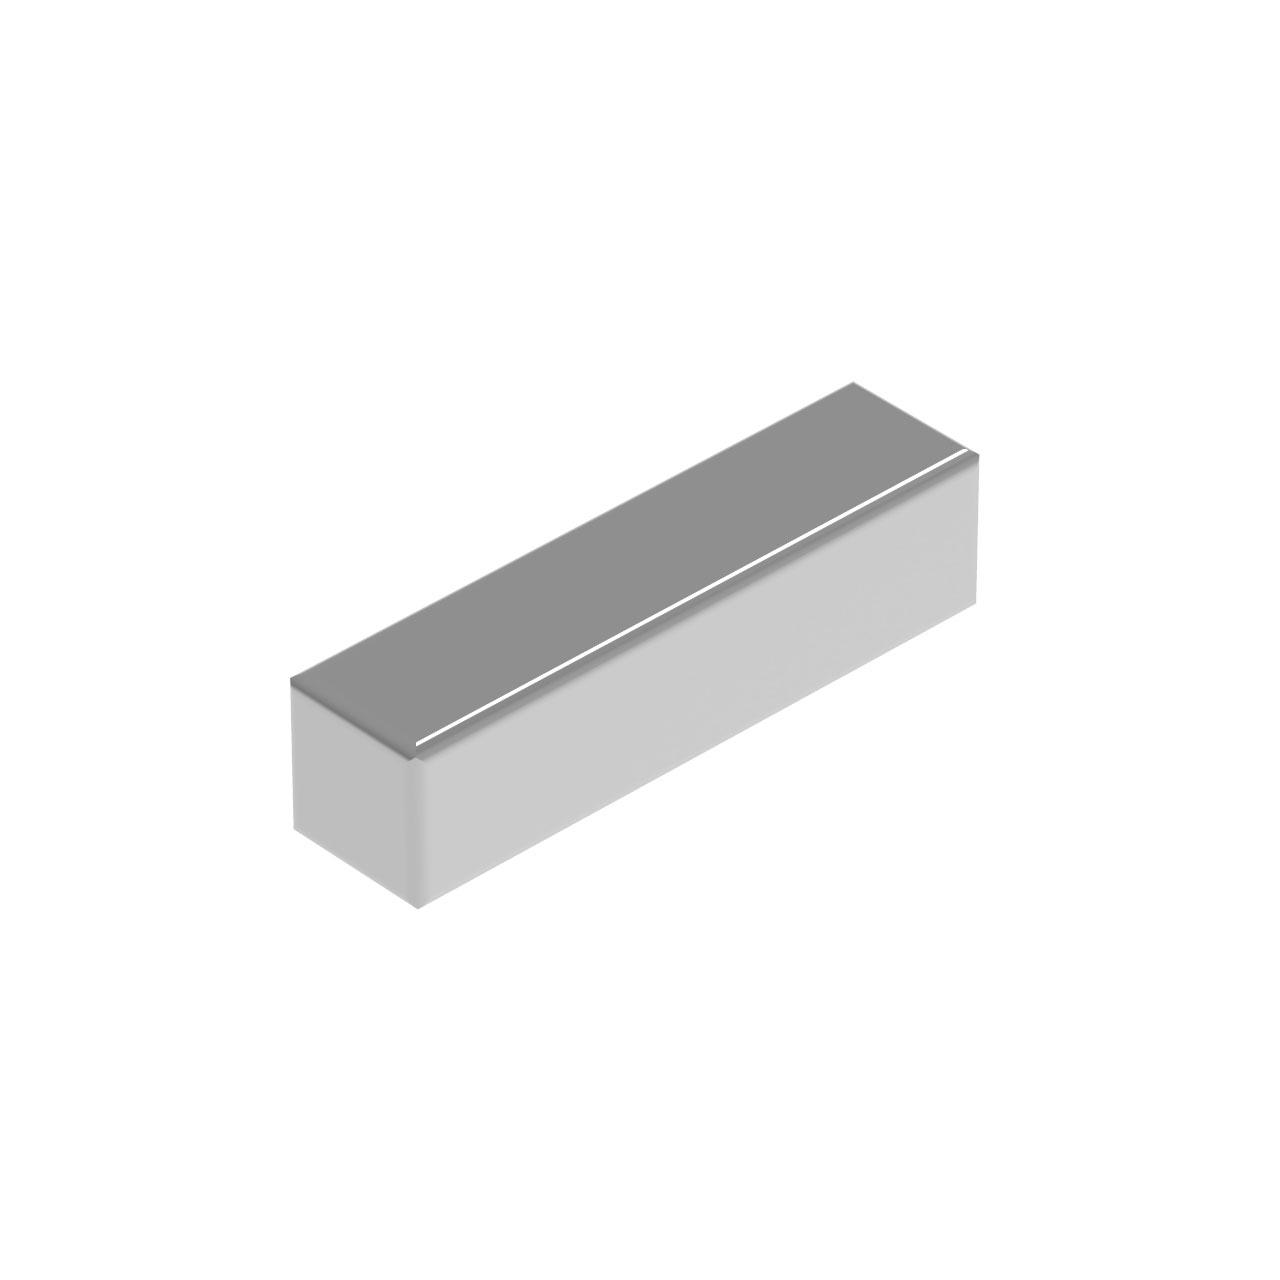 HIQPARTS(ハイキューパーツ) ネオジム磁石 N52 角形 1mm x 4mm x 高さ1mm(10個入) [MGNSQ141] 4582370701900